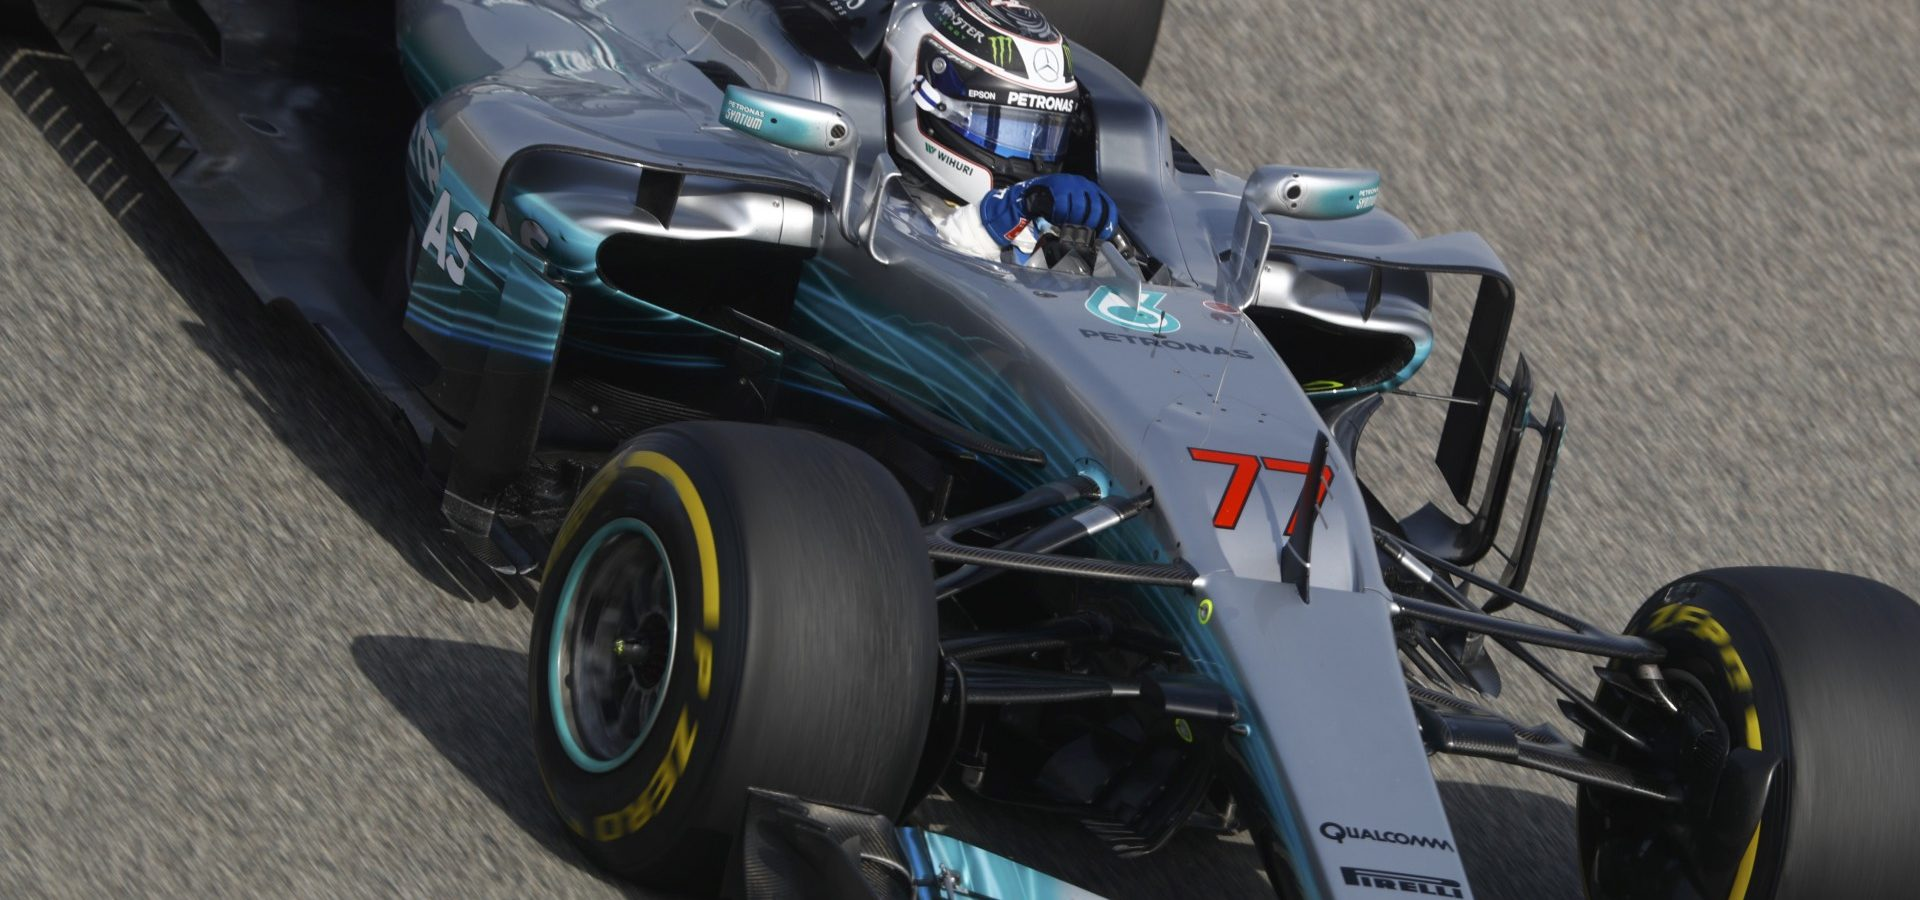 2017 Bahrain Grand Prix, Saturday - Steve Etherington